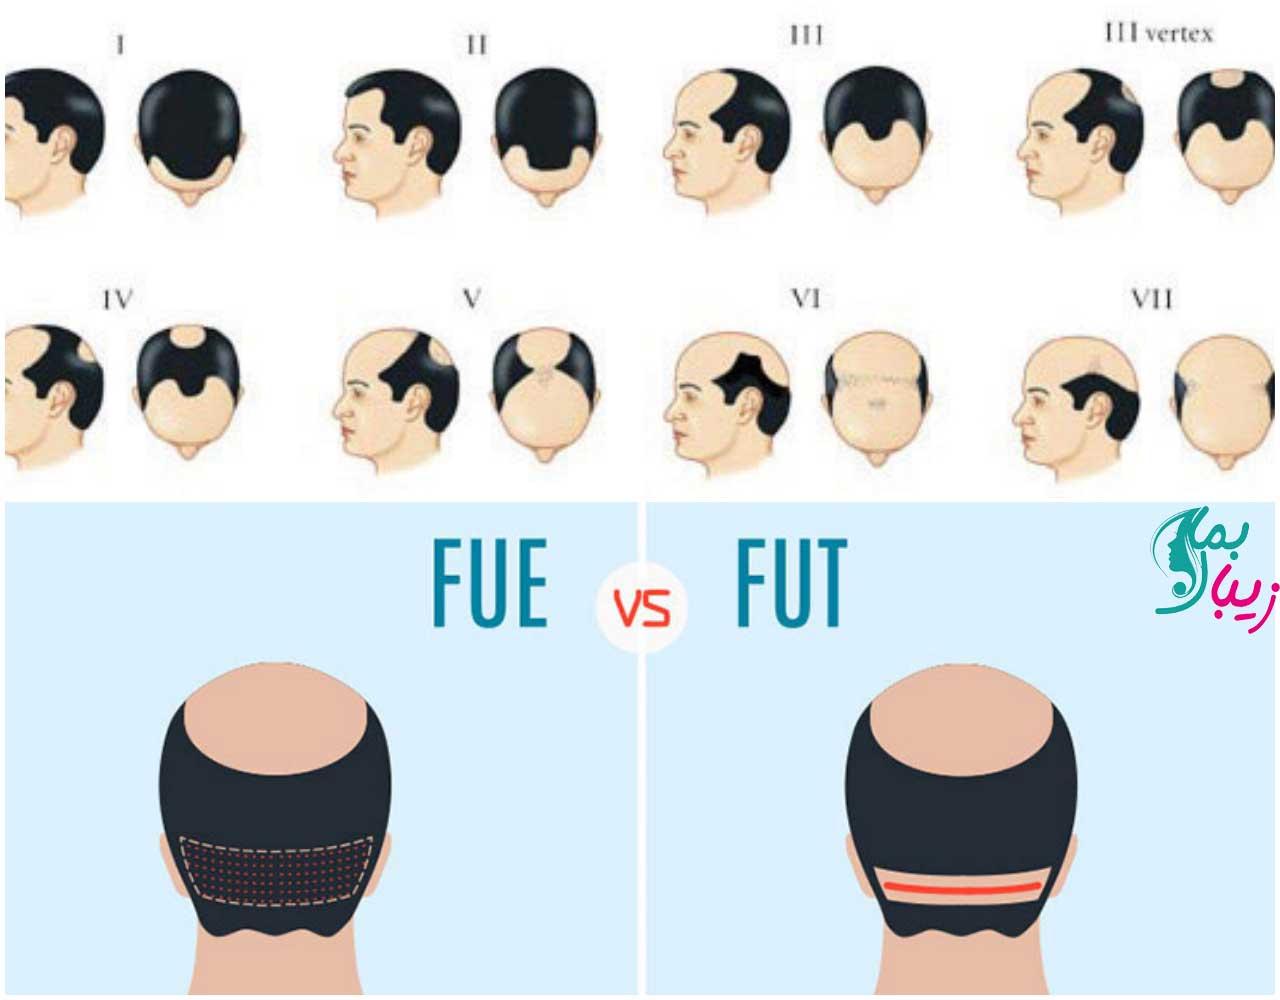 تفاوت روش کاشت مو FUE و FUT